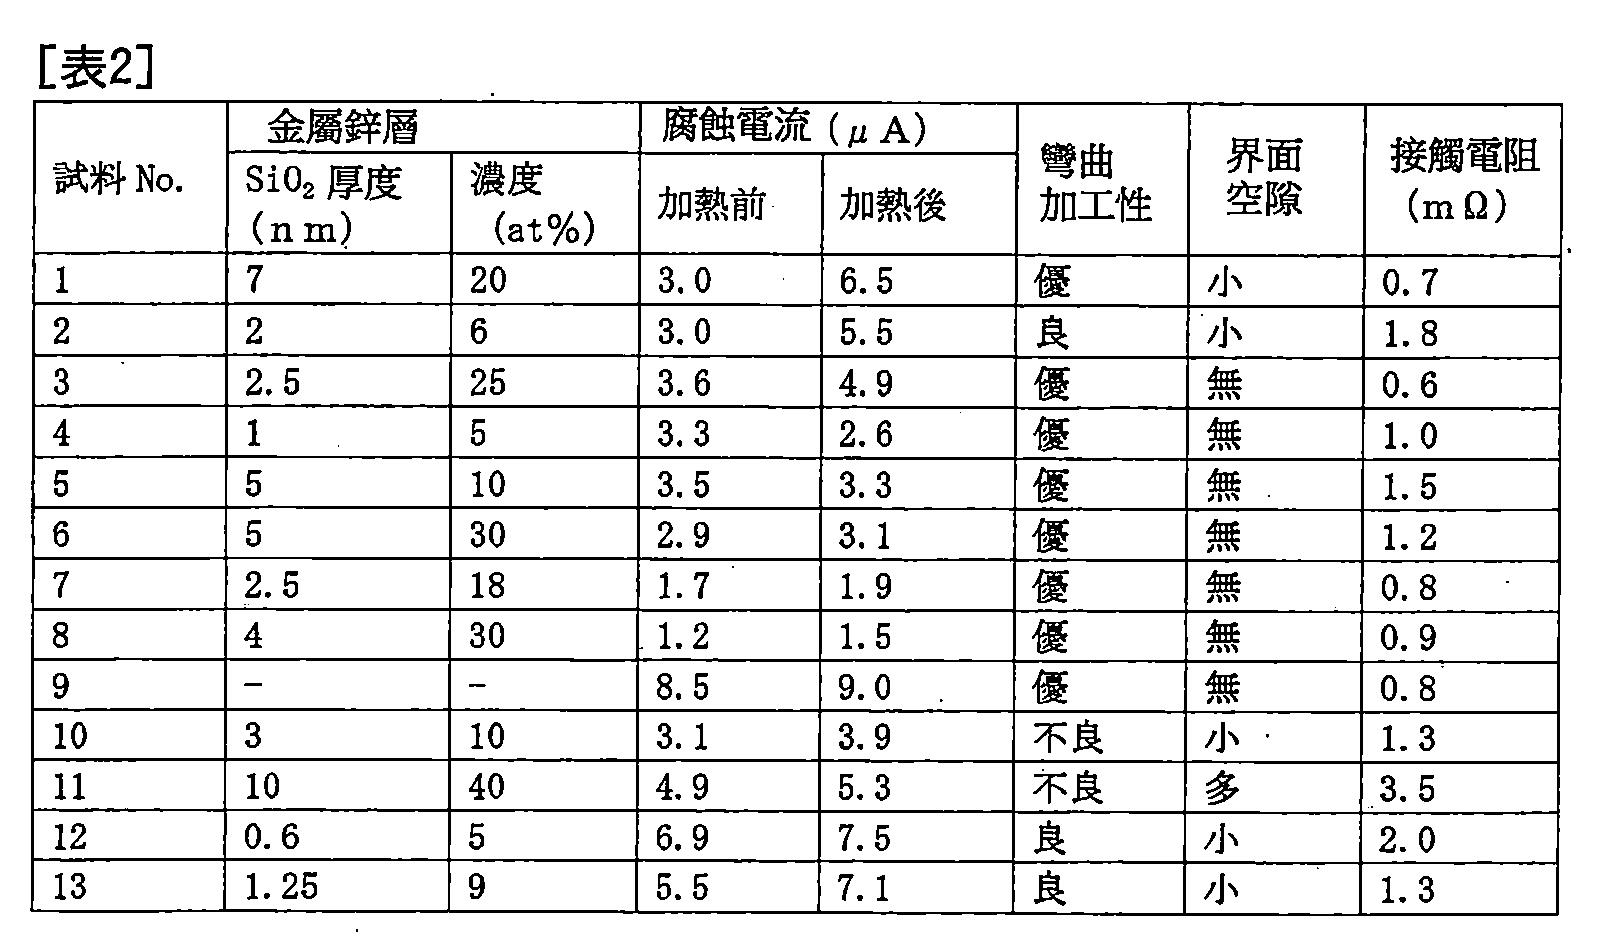 Figure 105141632-A0202-12-0019-2